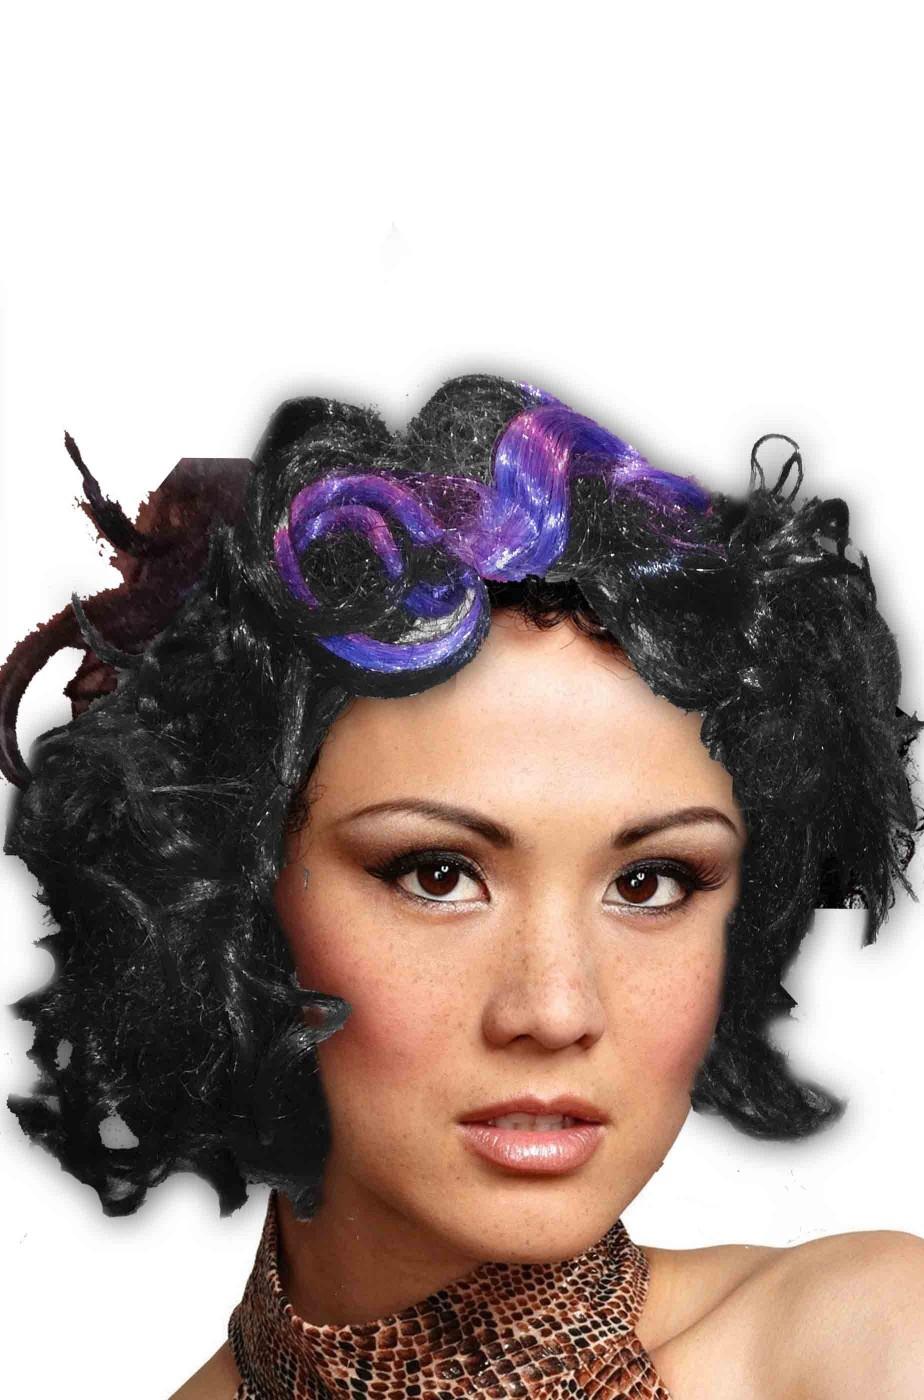 Parrucca nera con meche viola capelli corti mossi da strega 3227fb8283a7